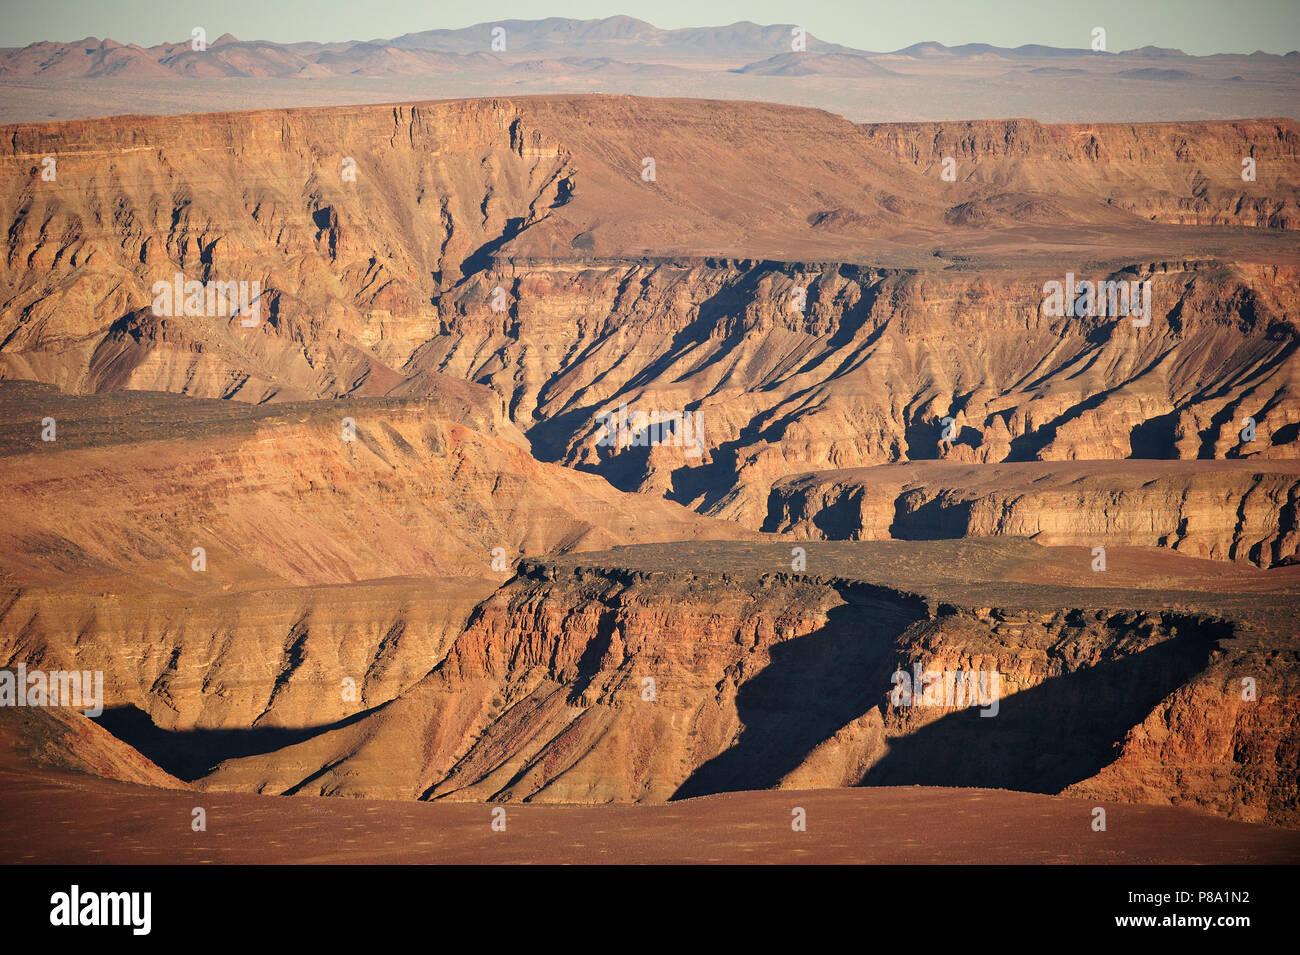 Fish River Canyon, Richtersveld National Park, Namibia - Stock Image